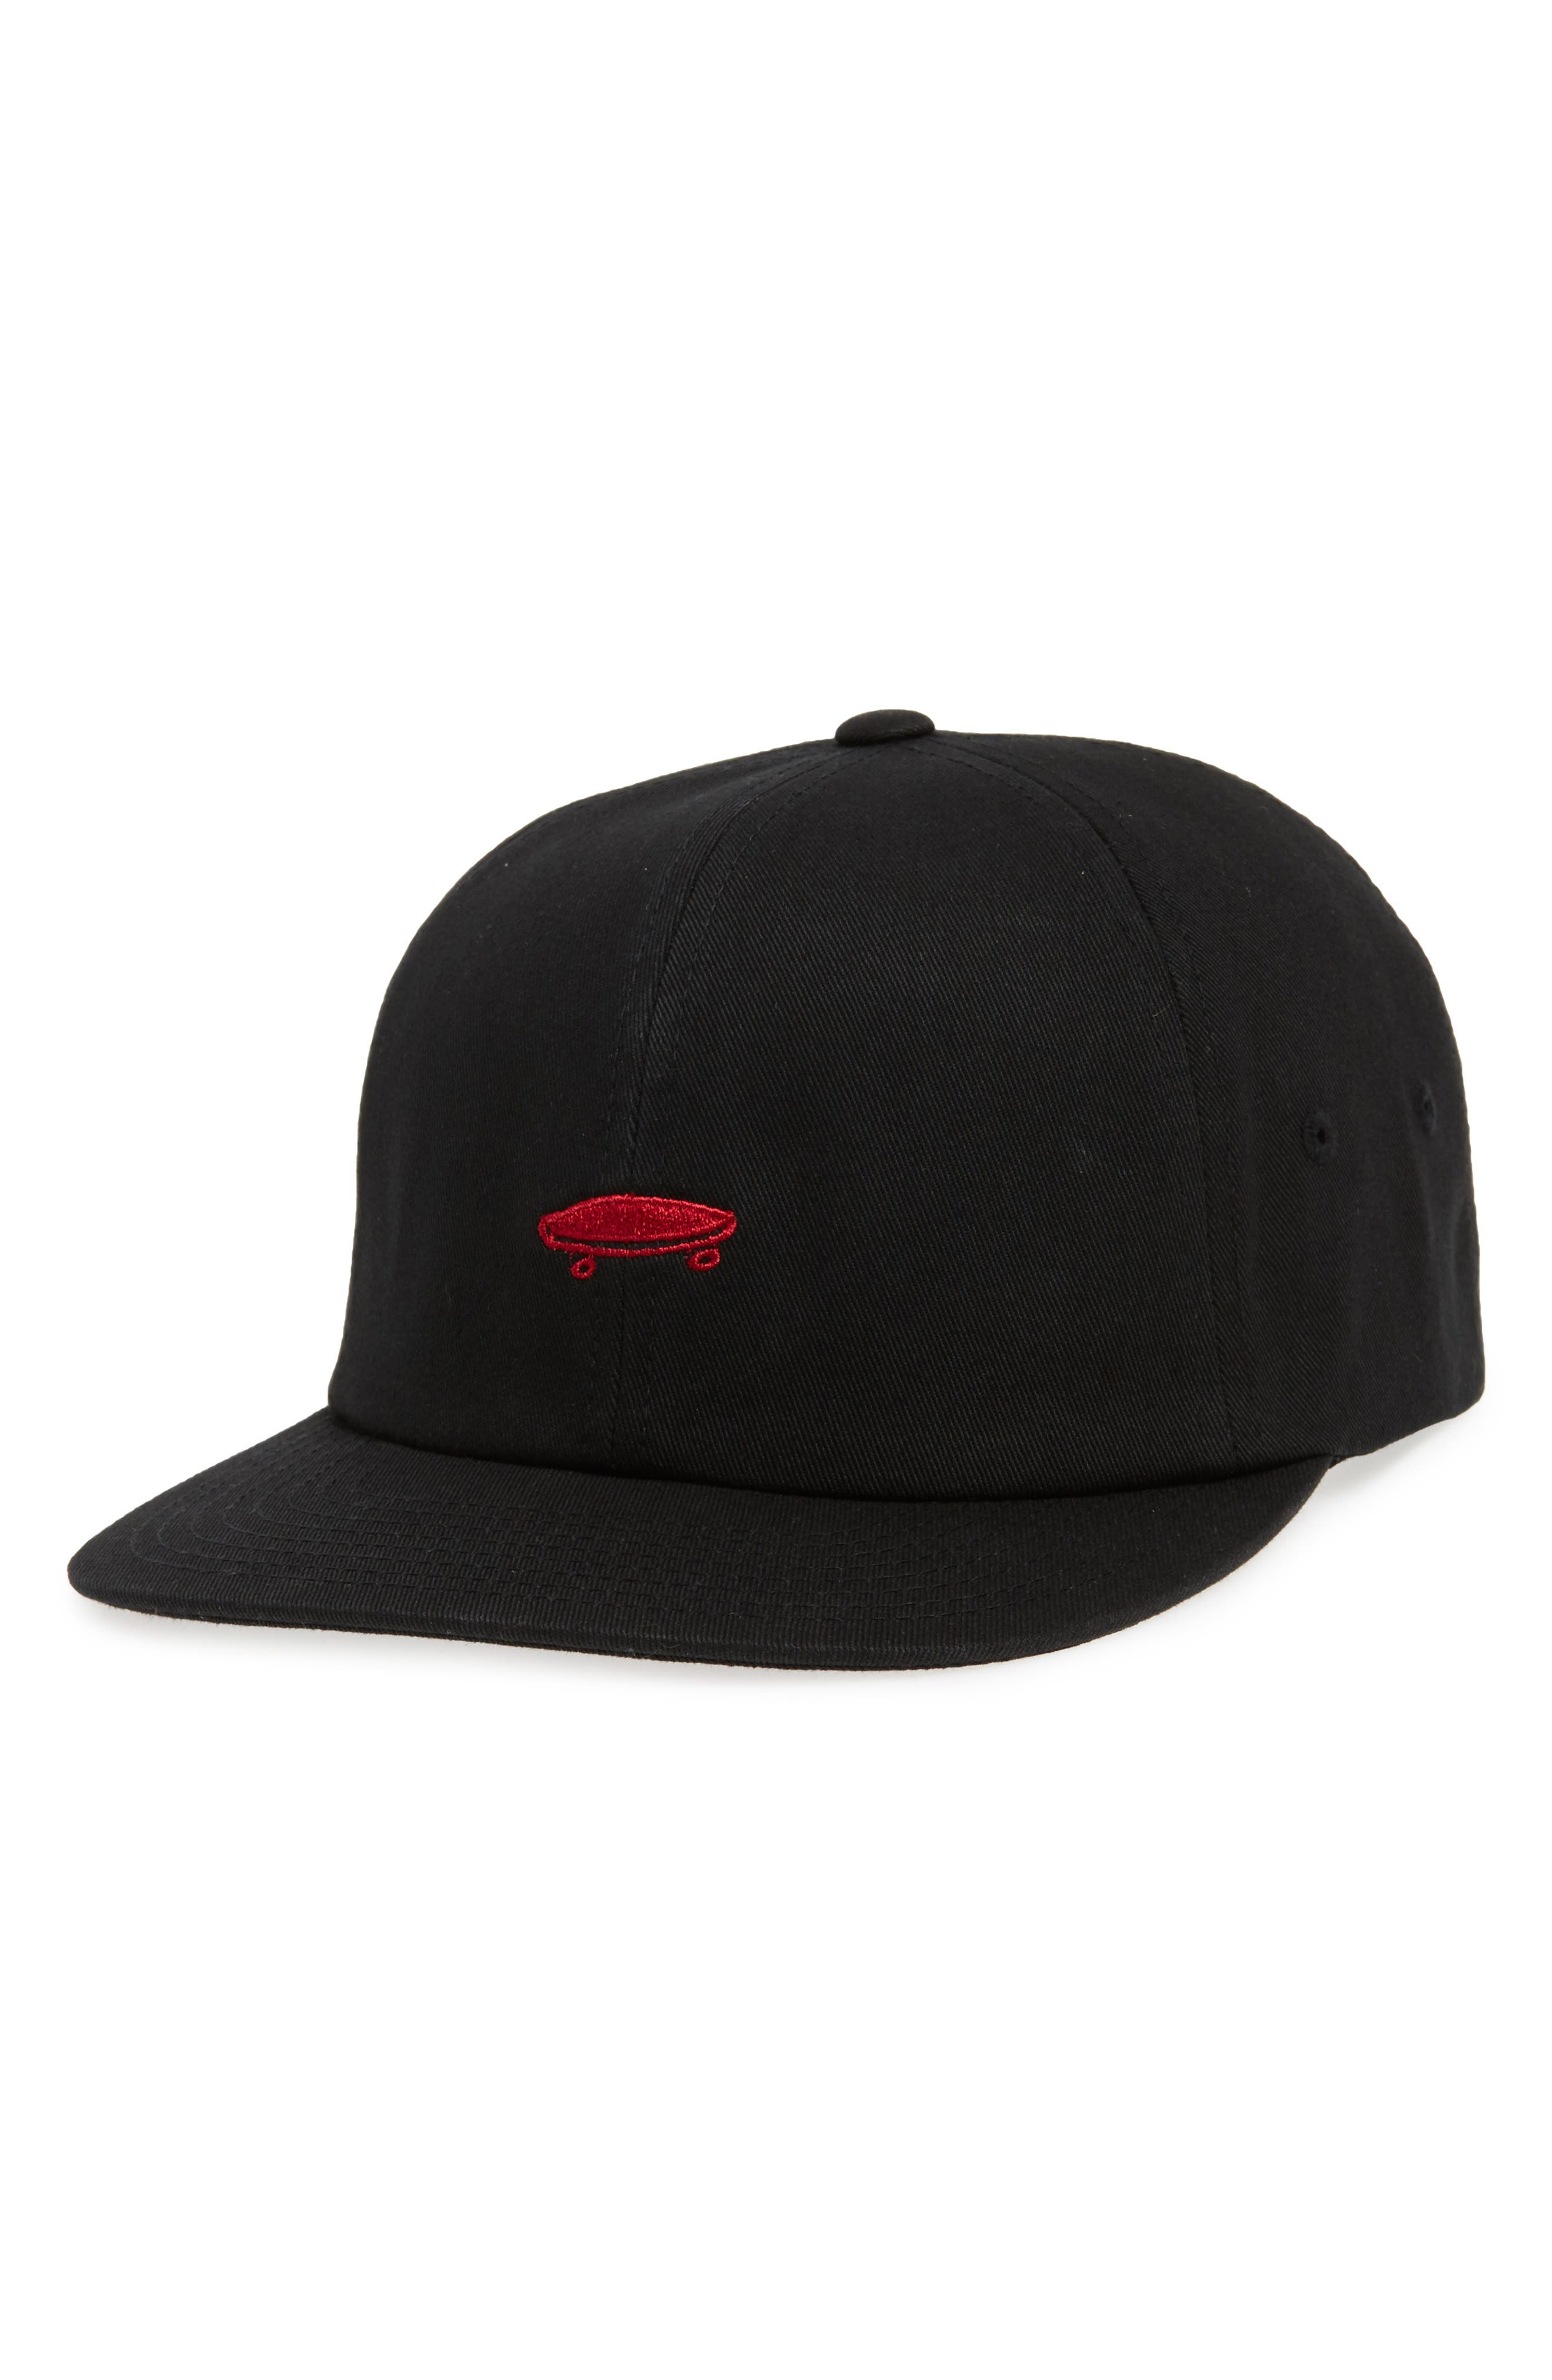 Vans SALTON II BALL CAP - BLACK